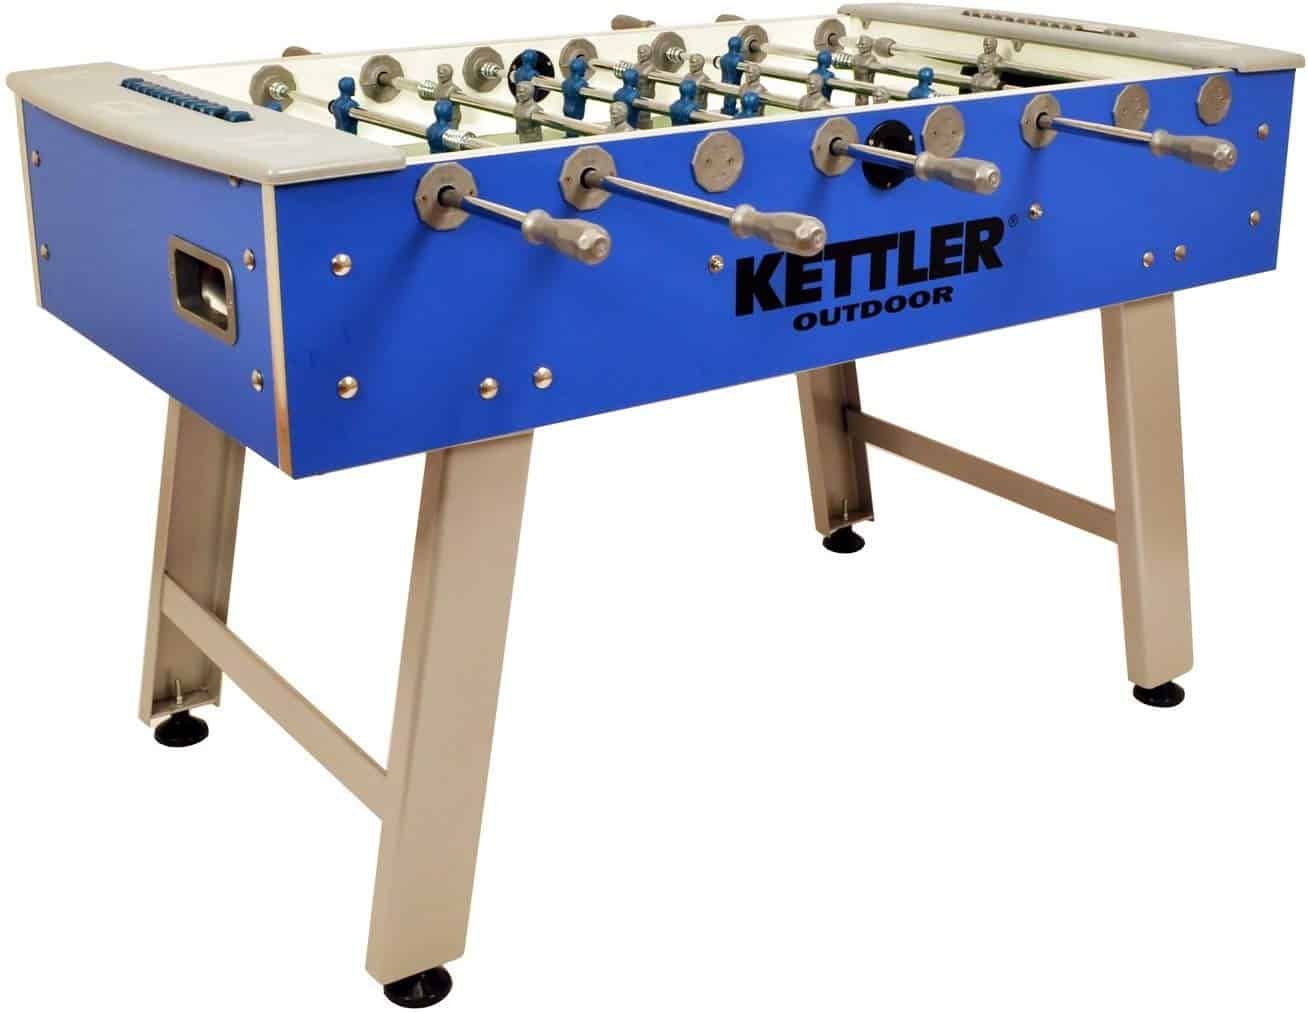 Kettler Cavalier 58 in Outdoor Foosball Table